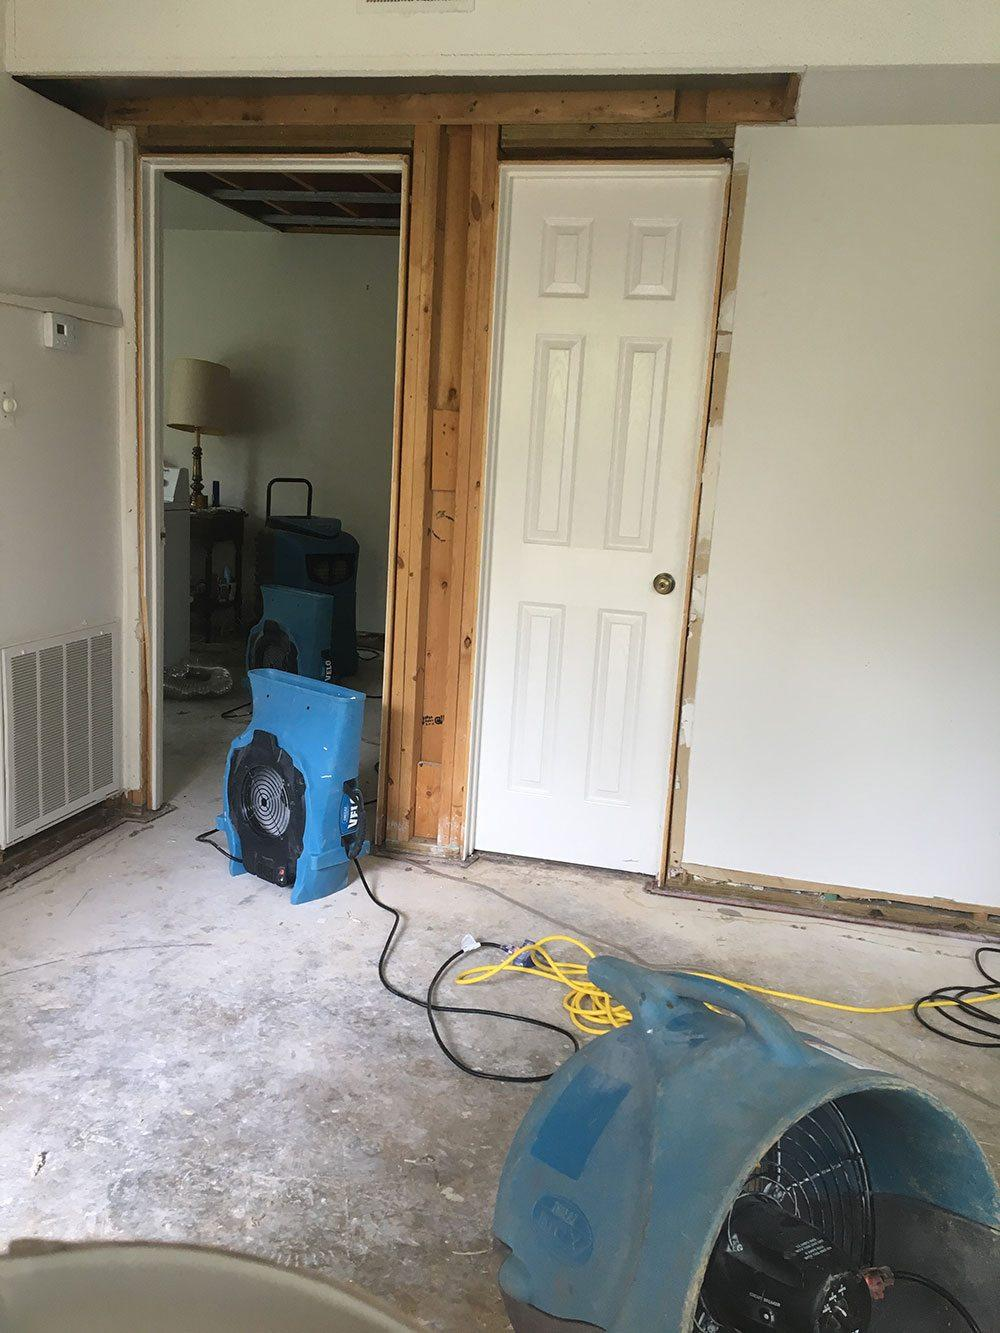 Washing Machine Condo Flood in Cary, NC 1